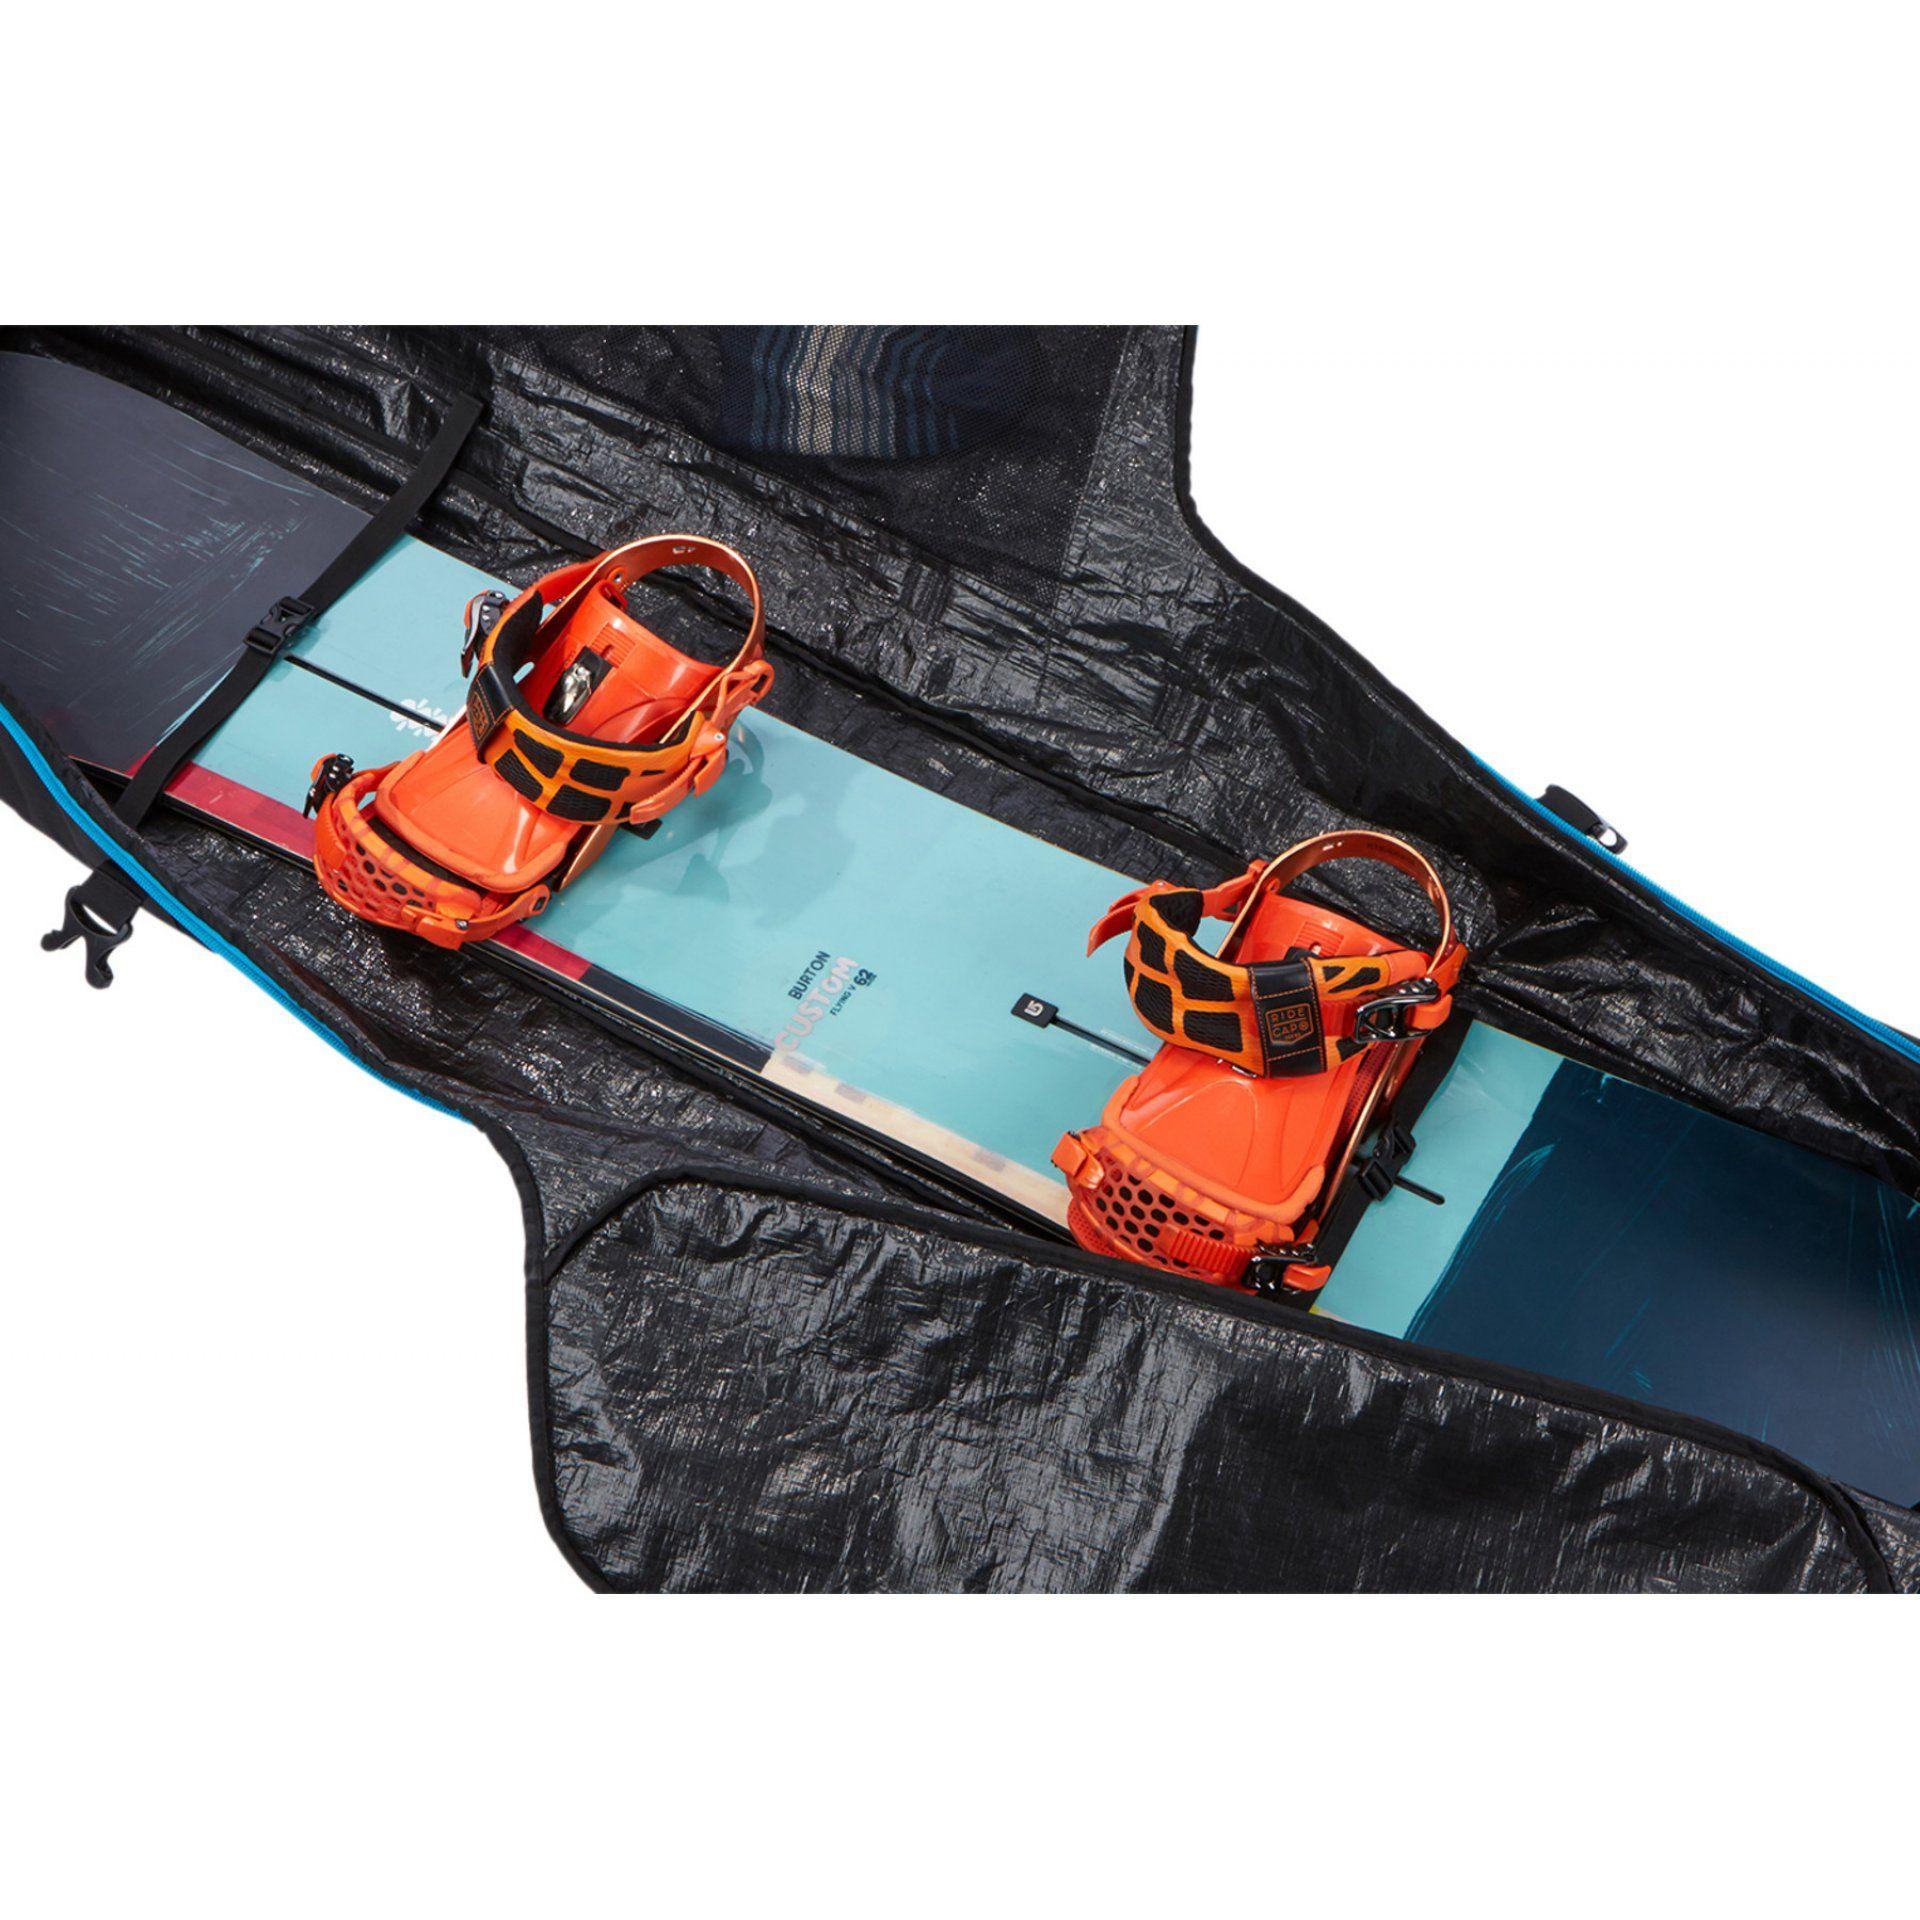 POKROWIEC NA SNOWBOARD THULE ROUNDTRIP SNOWBOARD ROLLER POSEIDON 9